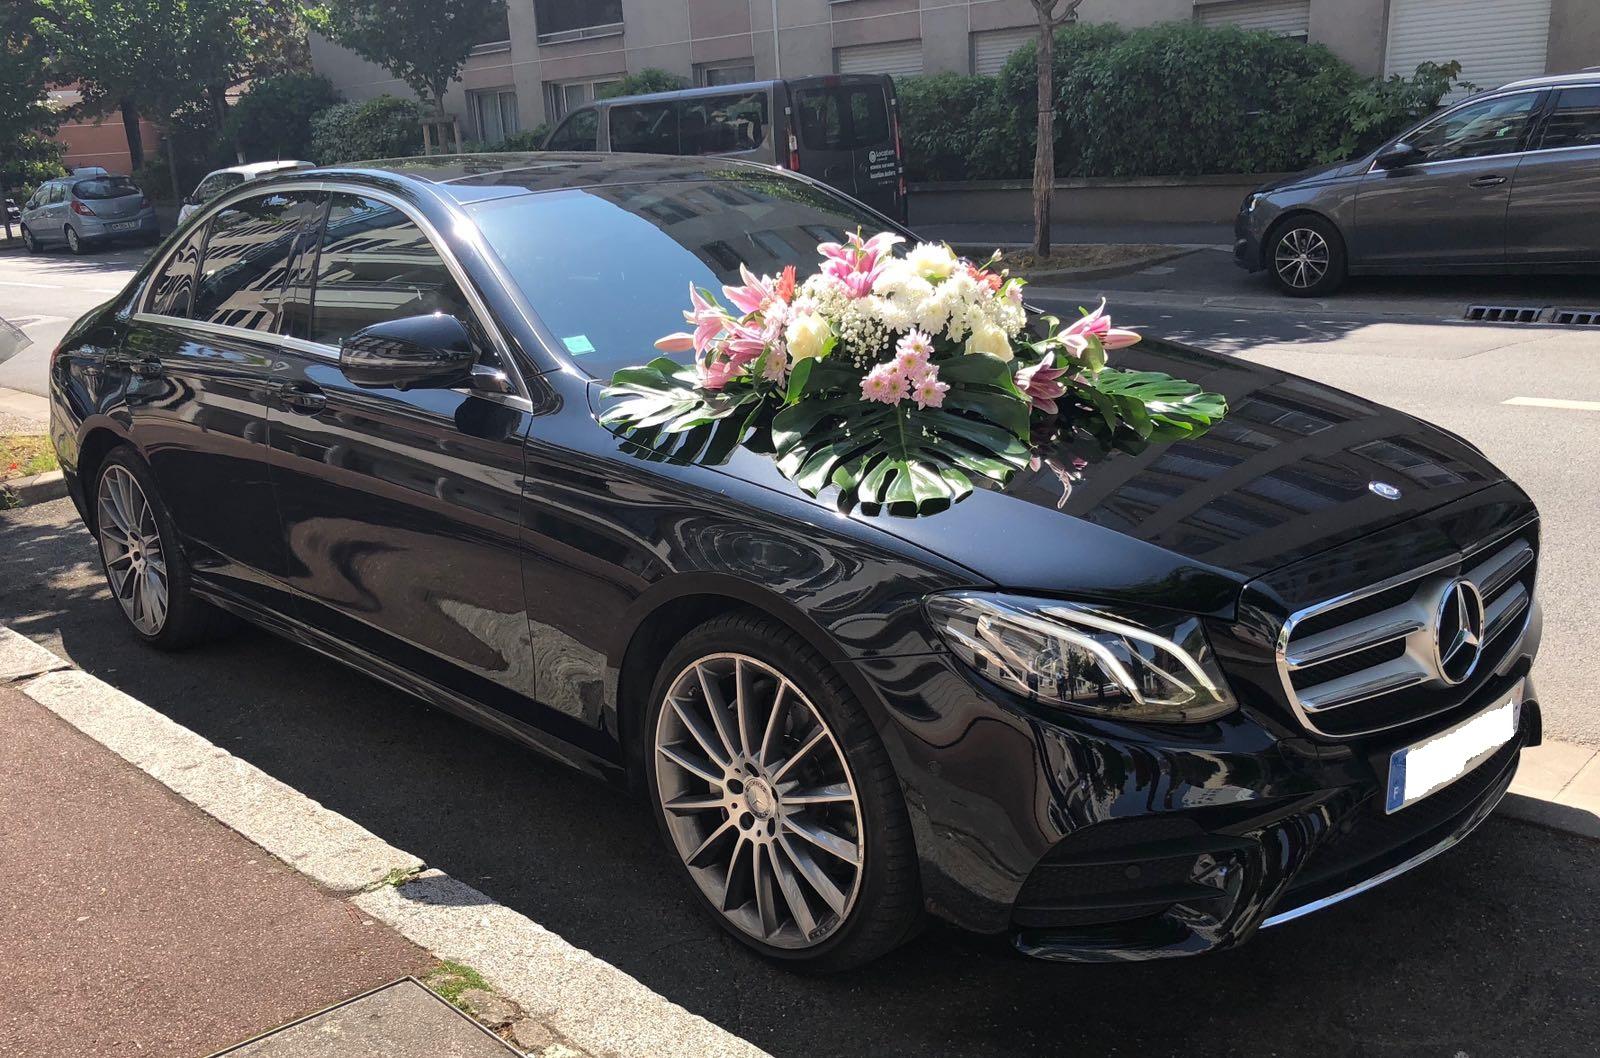 Mercedes class E pour mariage